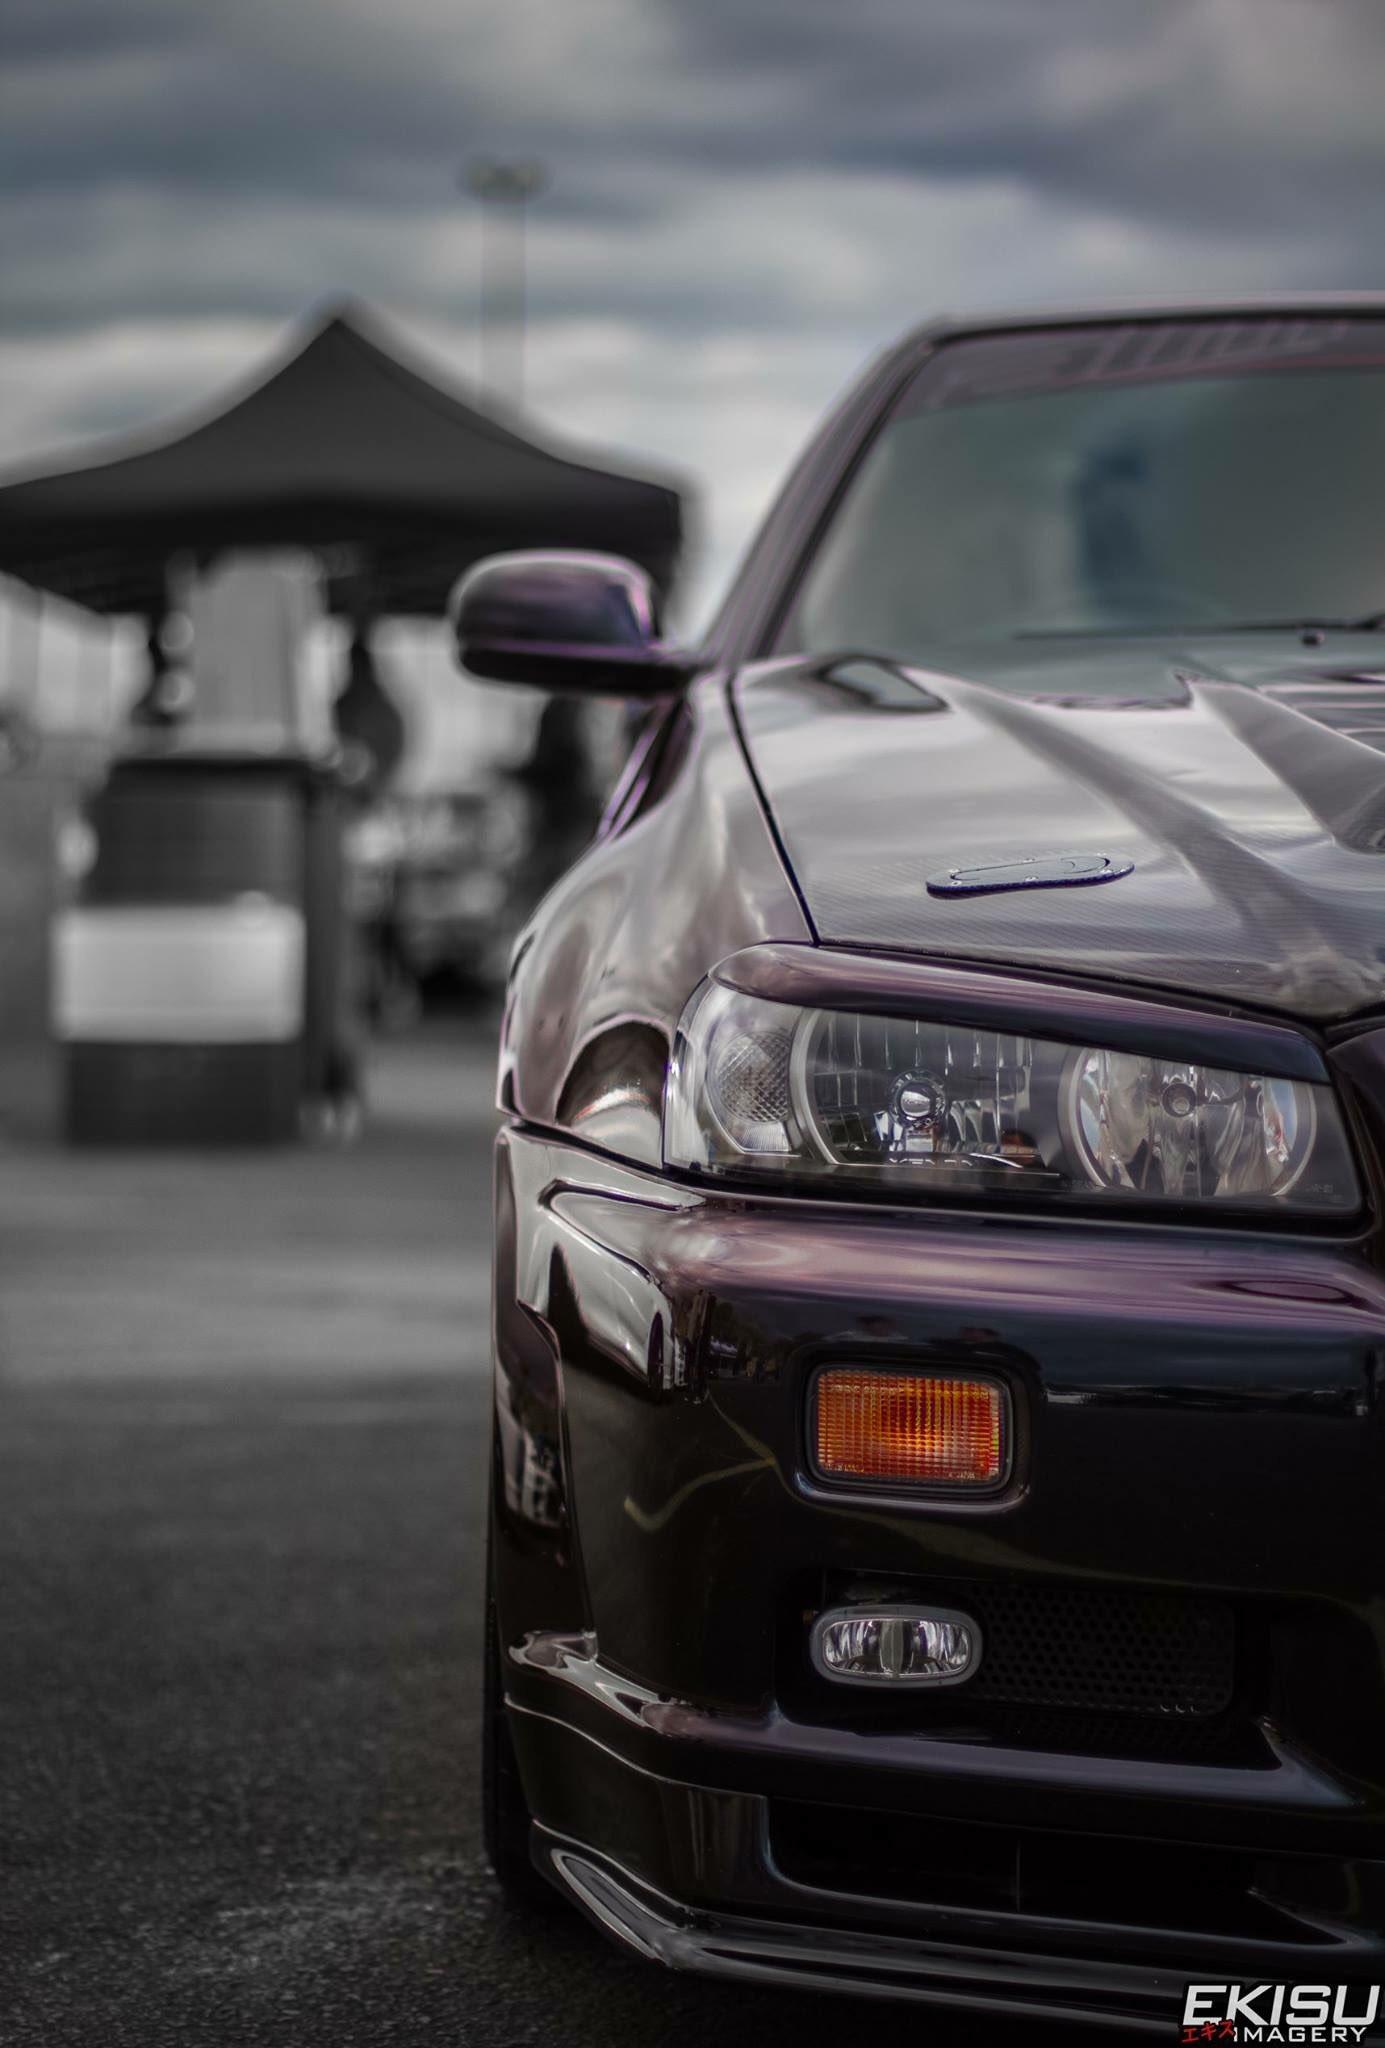 Hd Jdm Car Wallpapers Ekisuimagery On Twitter Quot Nissan R34 Gtr Mobile Wallpaper